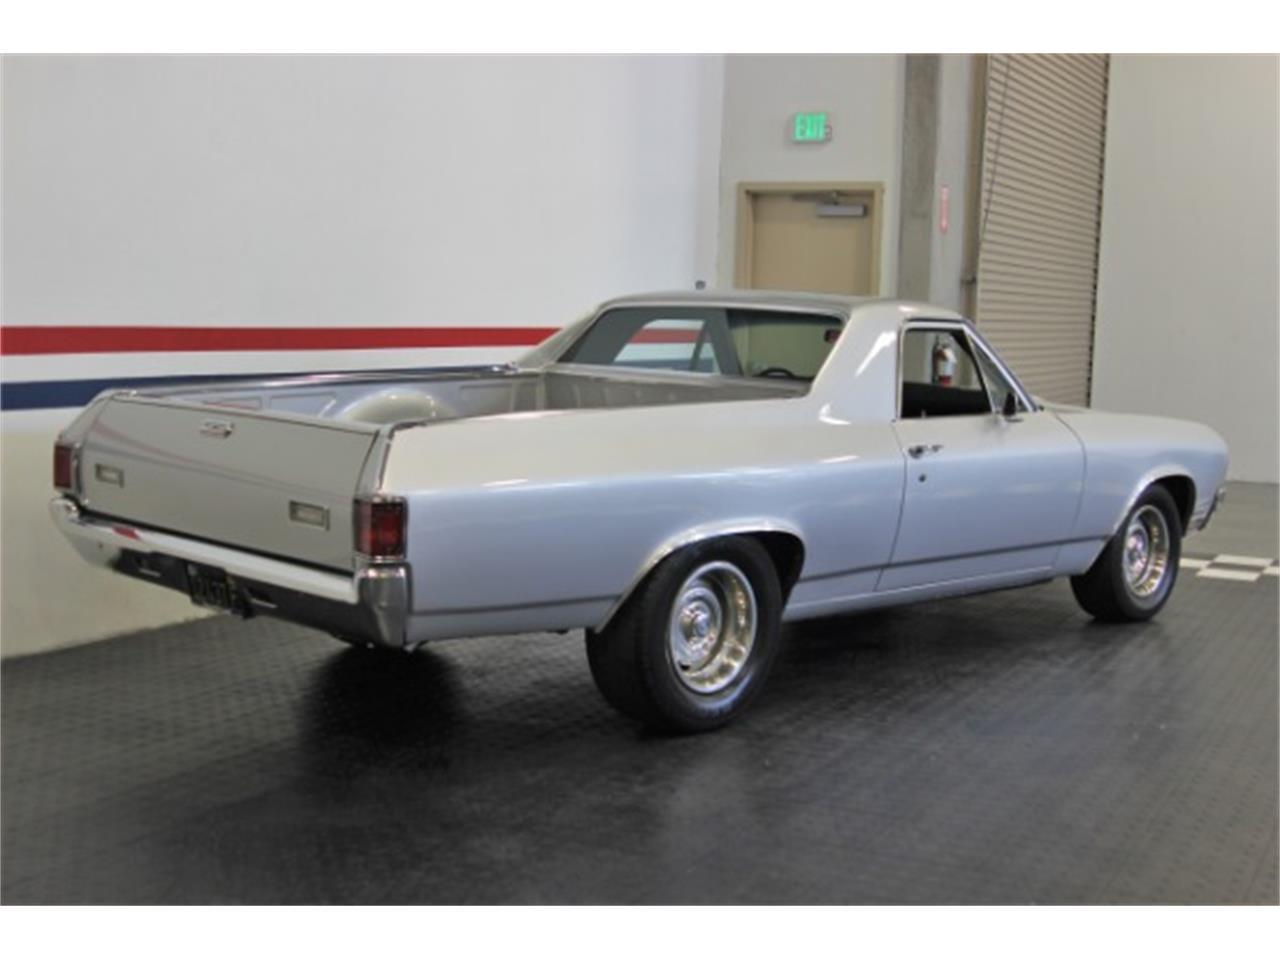 1970 Chevrolet El Camino (CC-1340404) for sale in San Ramon, California